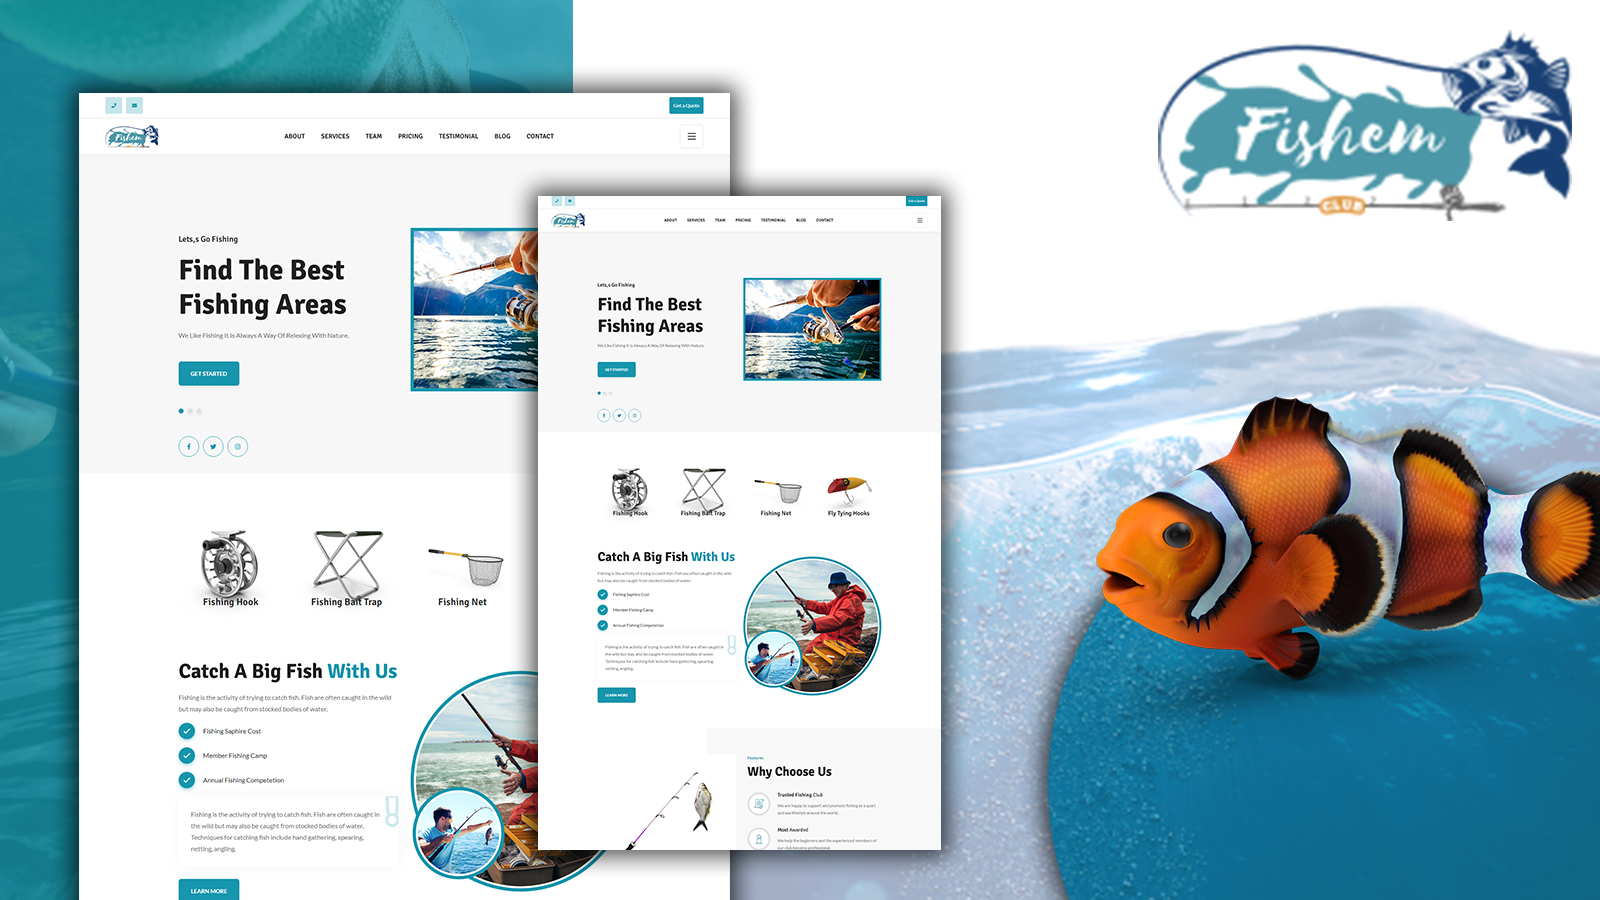 Fishem - Fishing HTML5 Landing Page Template